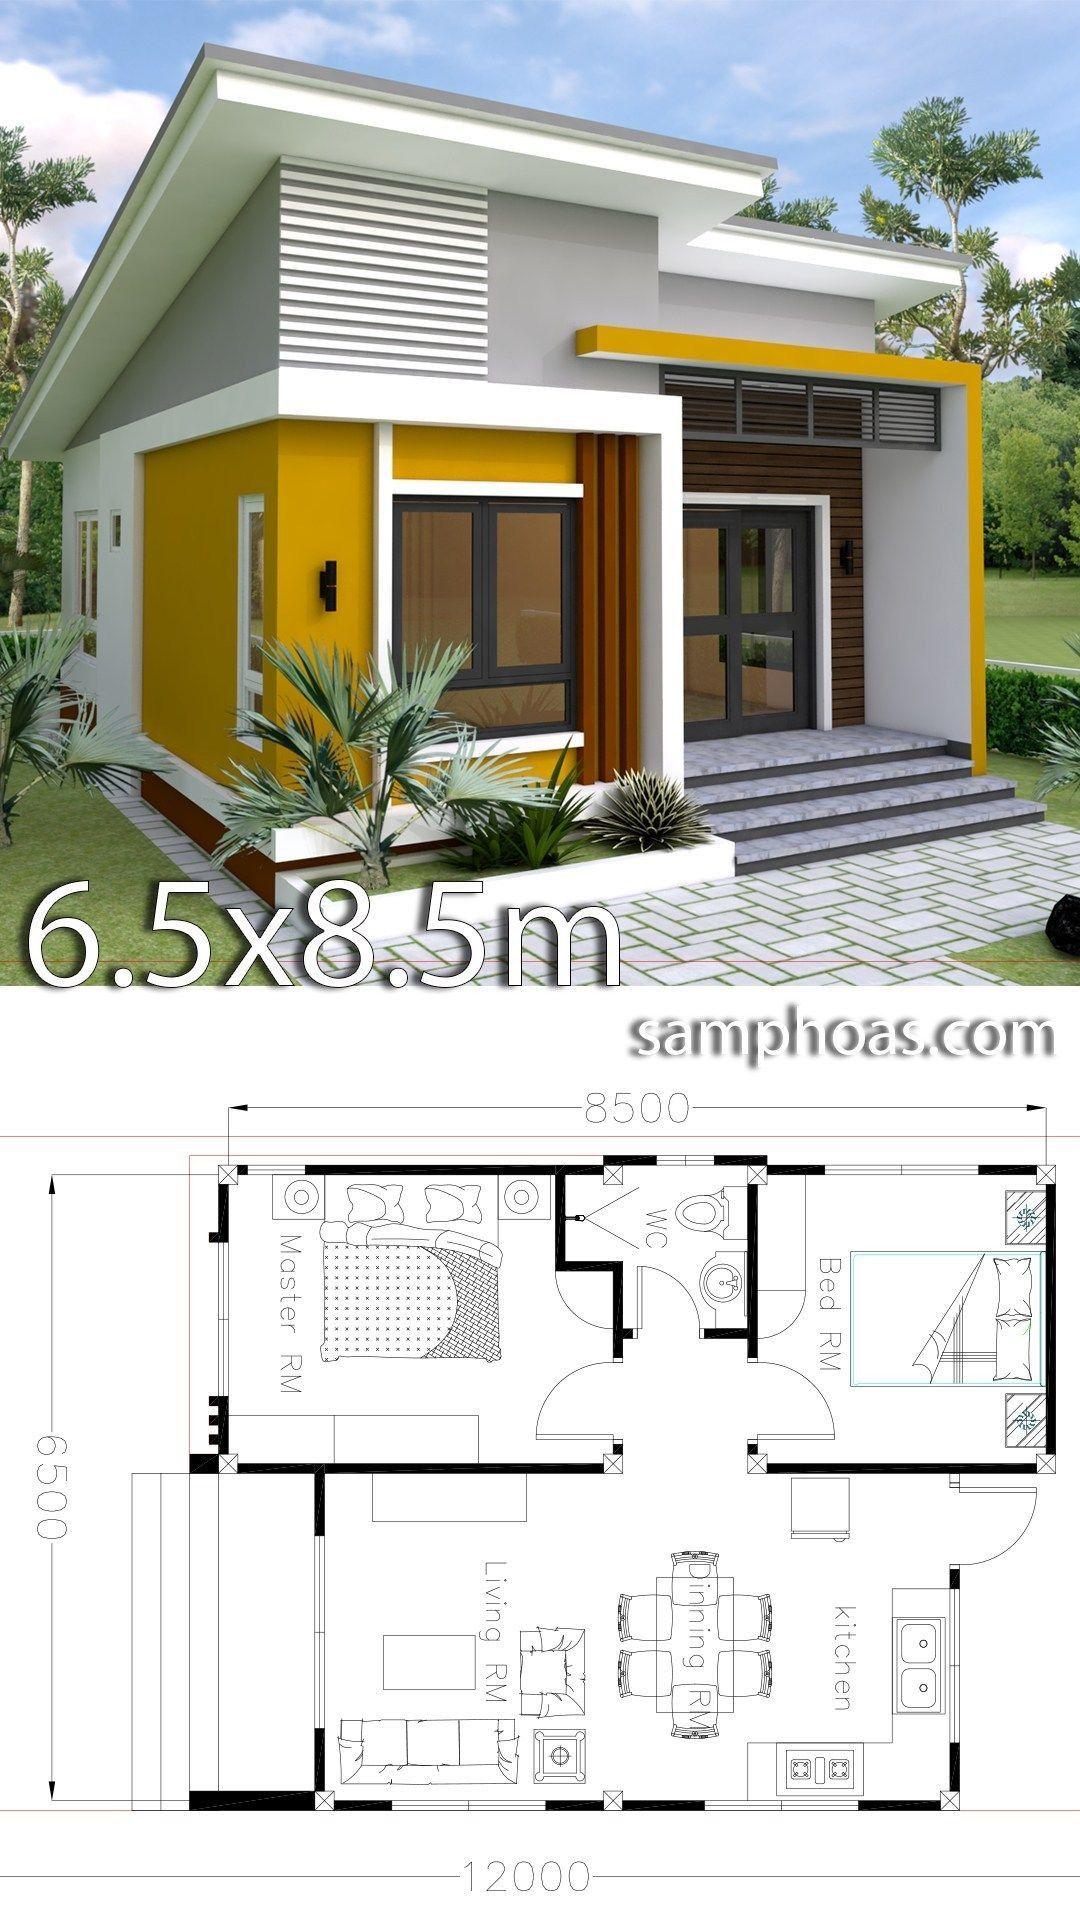 Unique Small House Plans 2 Floors Simple Small Home Design Plan 6 5x8 5m With 2 Bedrooms Arsitektur Membangun Rumah Arsitektur Modern